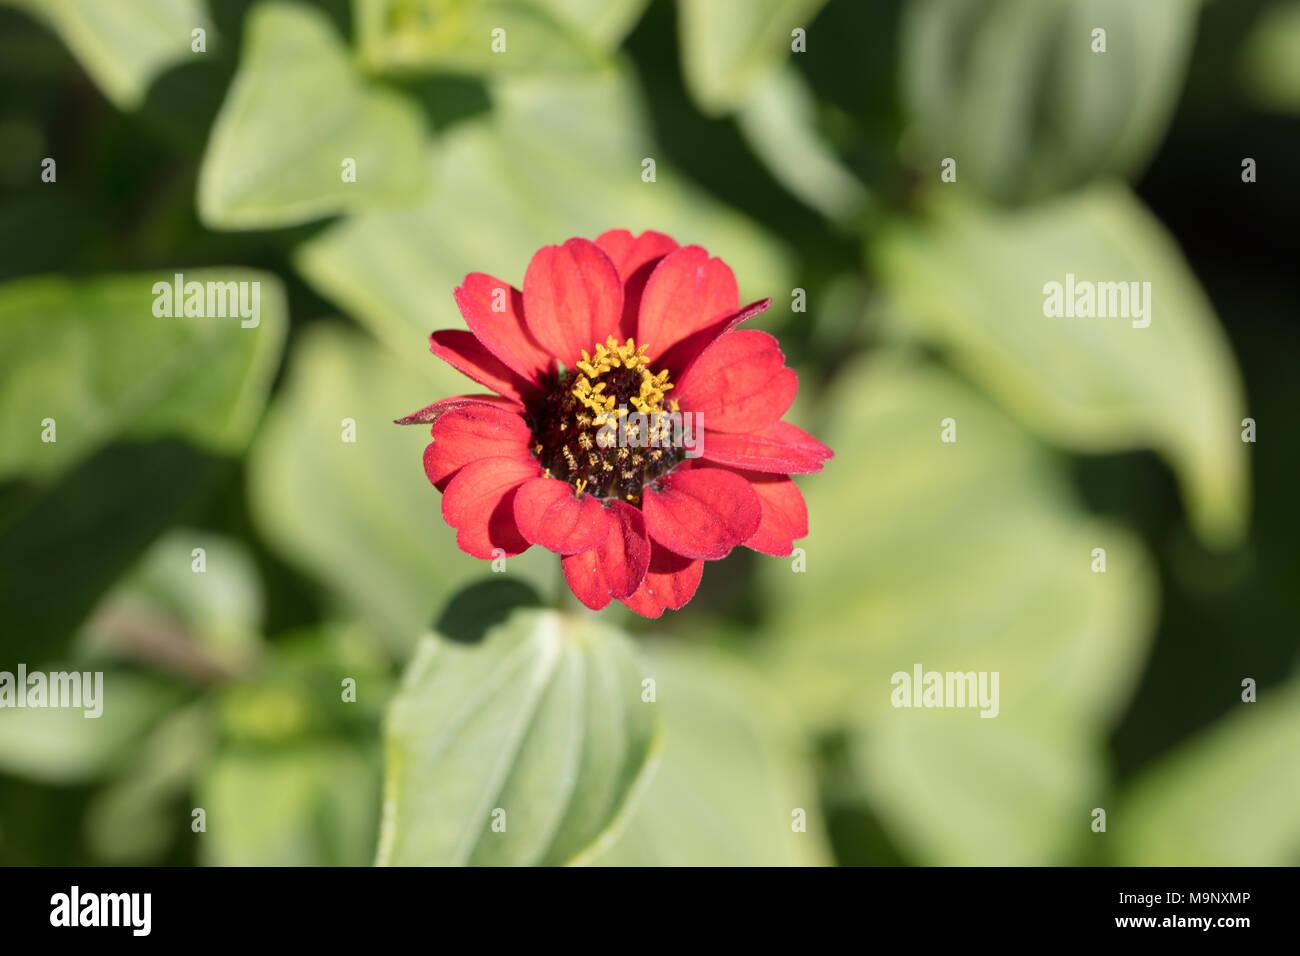 Zinnia peruviana, Chrysogonum peruvianum, Crassina intermedia, Crassina leptopoda, Crassina multiflora, Crassina peruviana, Crassina tenuiflora, Crassina verticillata, Lepia pauciflora, Zinnia hybrida, Zinnia intermedia, Zinnia leptopoda, Zinnia mendocina, Zinnia multiflora, Zinnia pauciflora, Zinnia revoluta, Zinnia tenuiflora, Zinnia verticillata, Spindelzinnia, Peruvian zinnia, red flowers, annual, native flora, Americas, ornamental garden plant, wildflower, weed, Asteraceae, compositae, aster, daisy, sunflower family, korgblommiga växter, Asterales, dicot, flowering plant, Asterordningen, - Stock Image